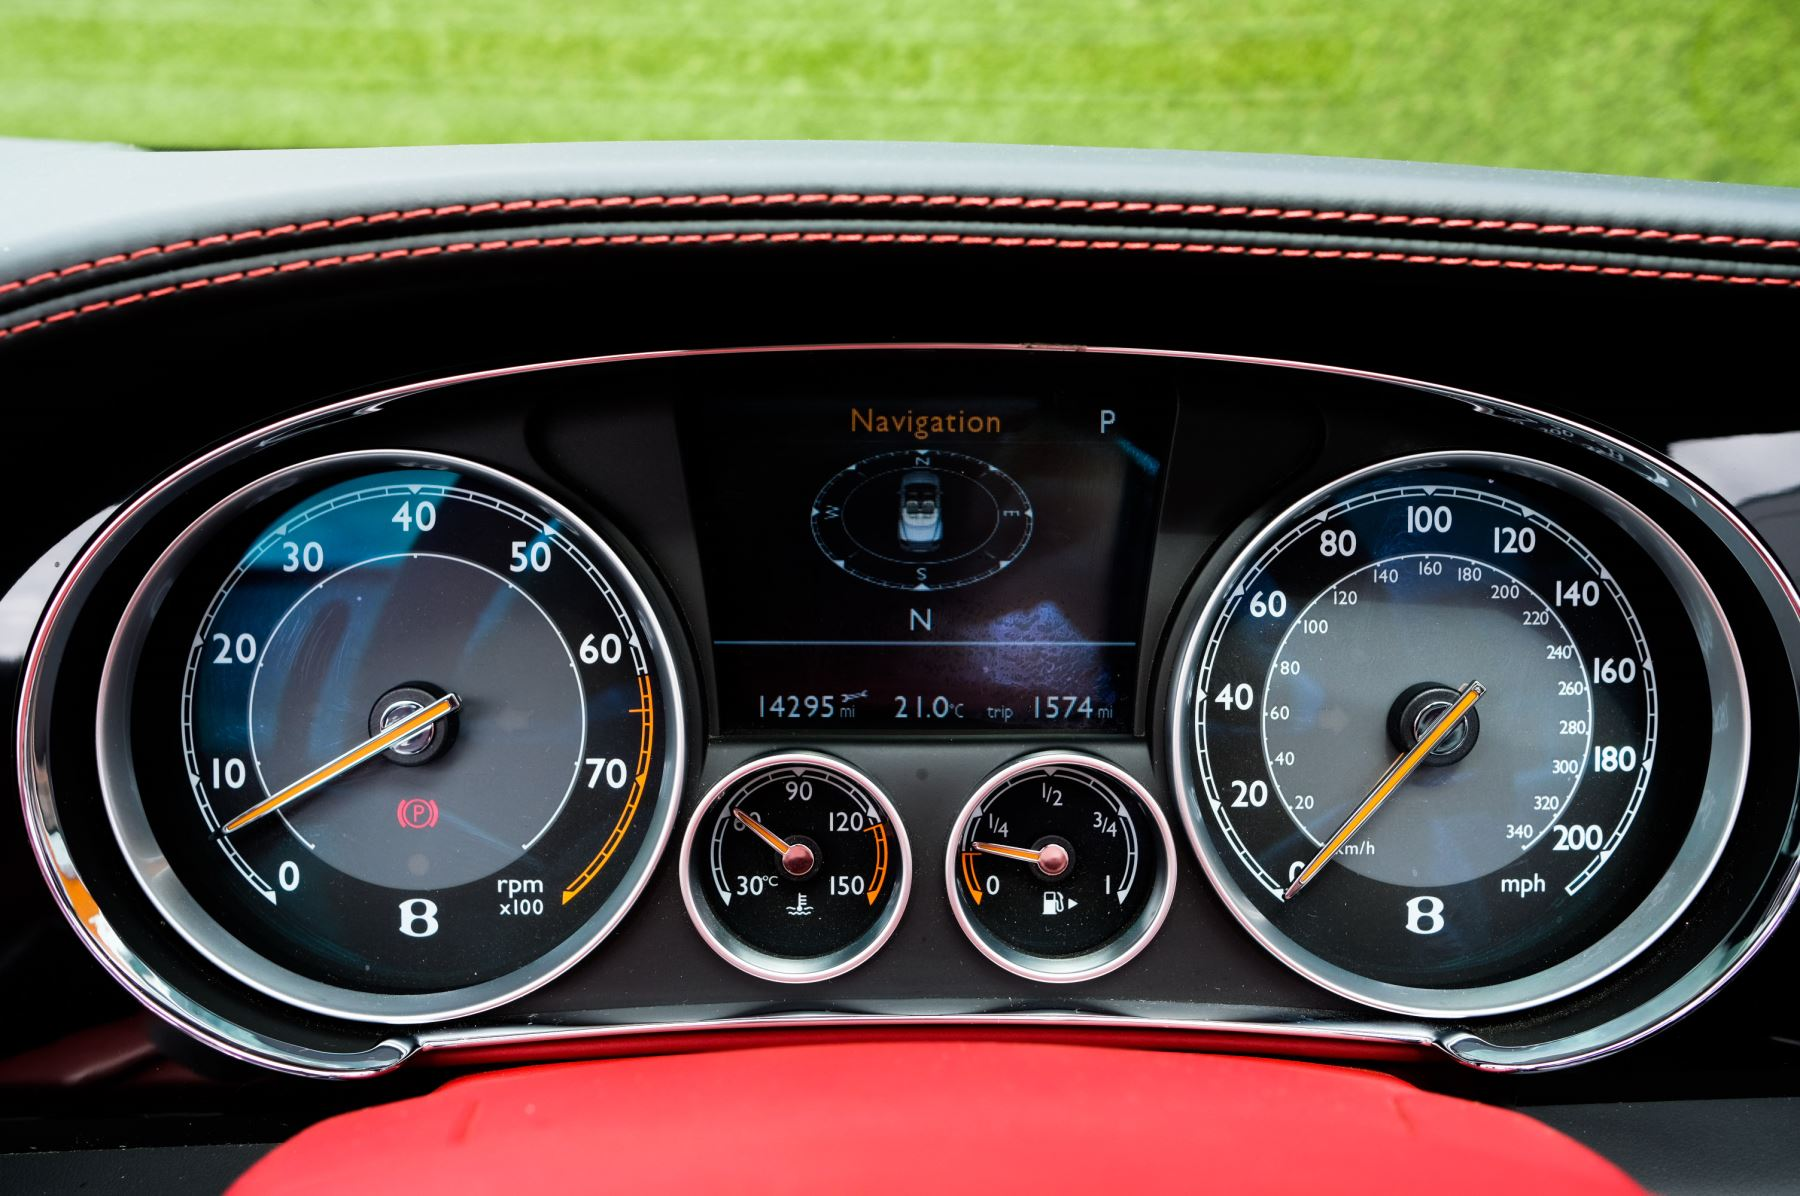 Bentley Continental GTC 6.0 W12 Speed - Massage Seats & Ventilation - Neck Warmer - Rear View Camera image 18